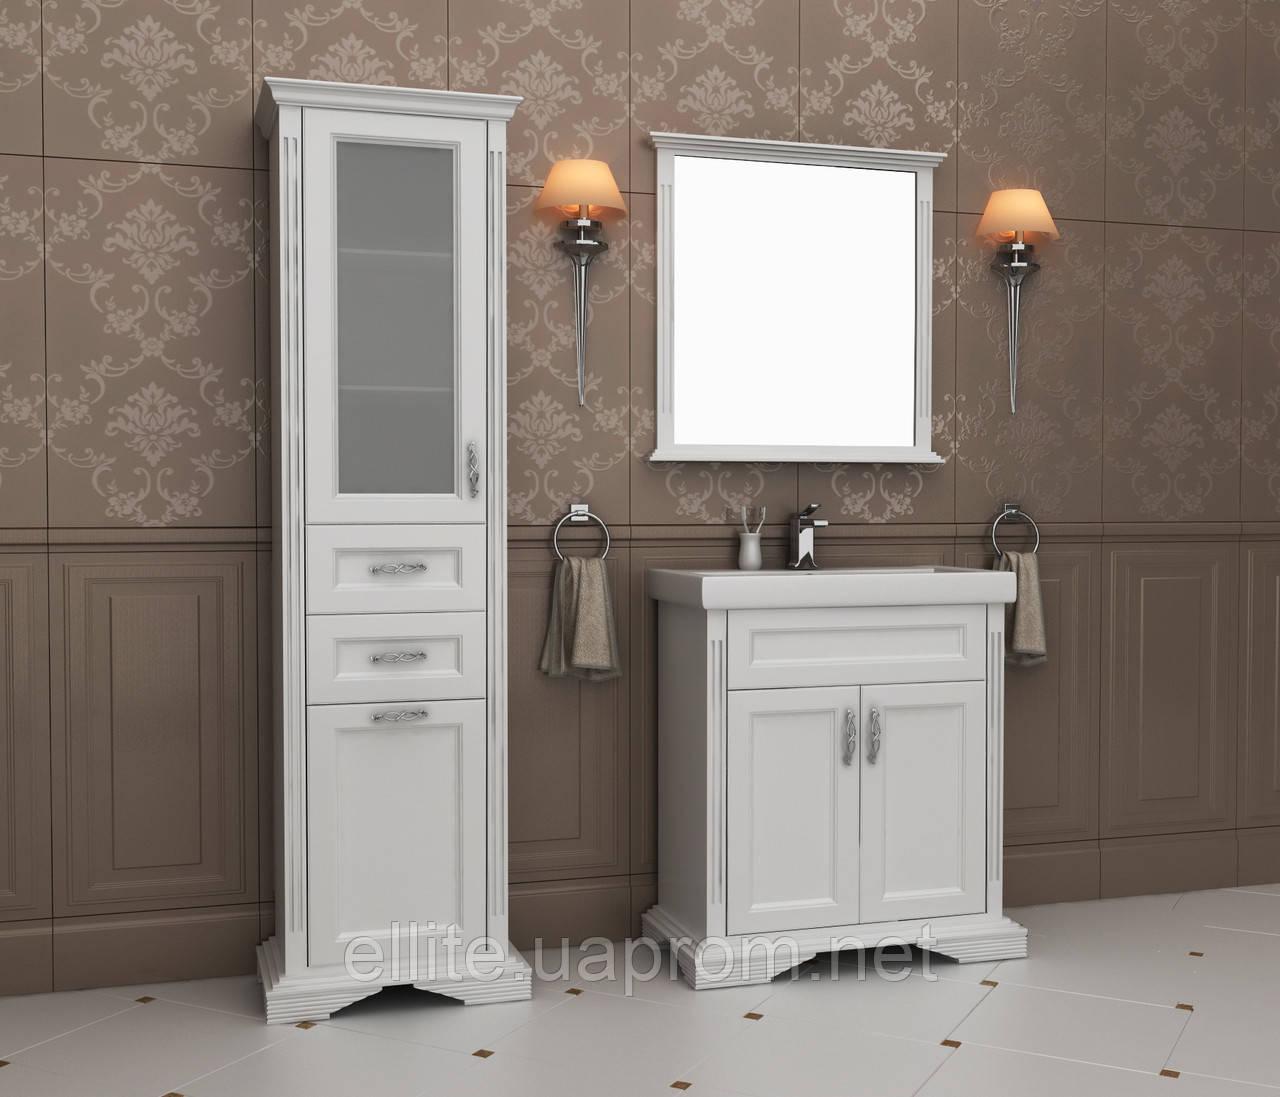 "Тумба и зеркало ""Атлант 70"" (керамика)"